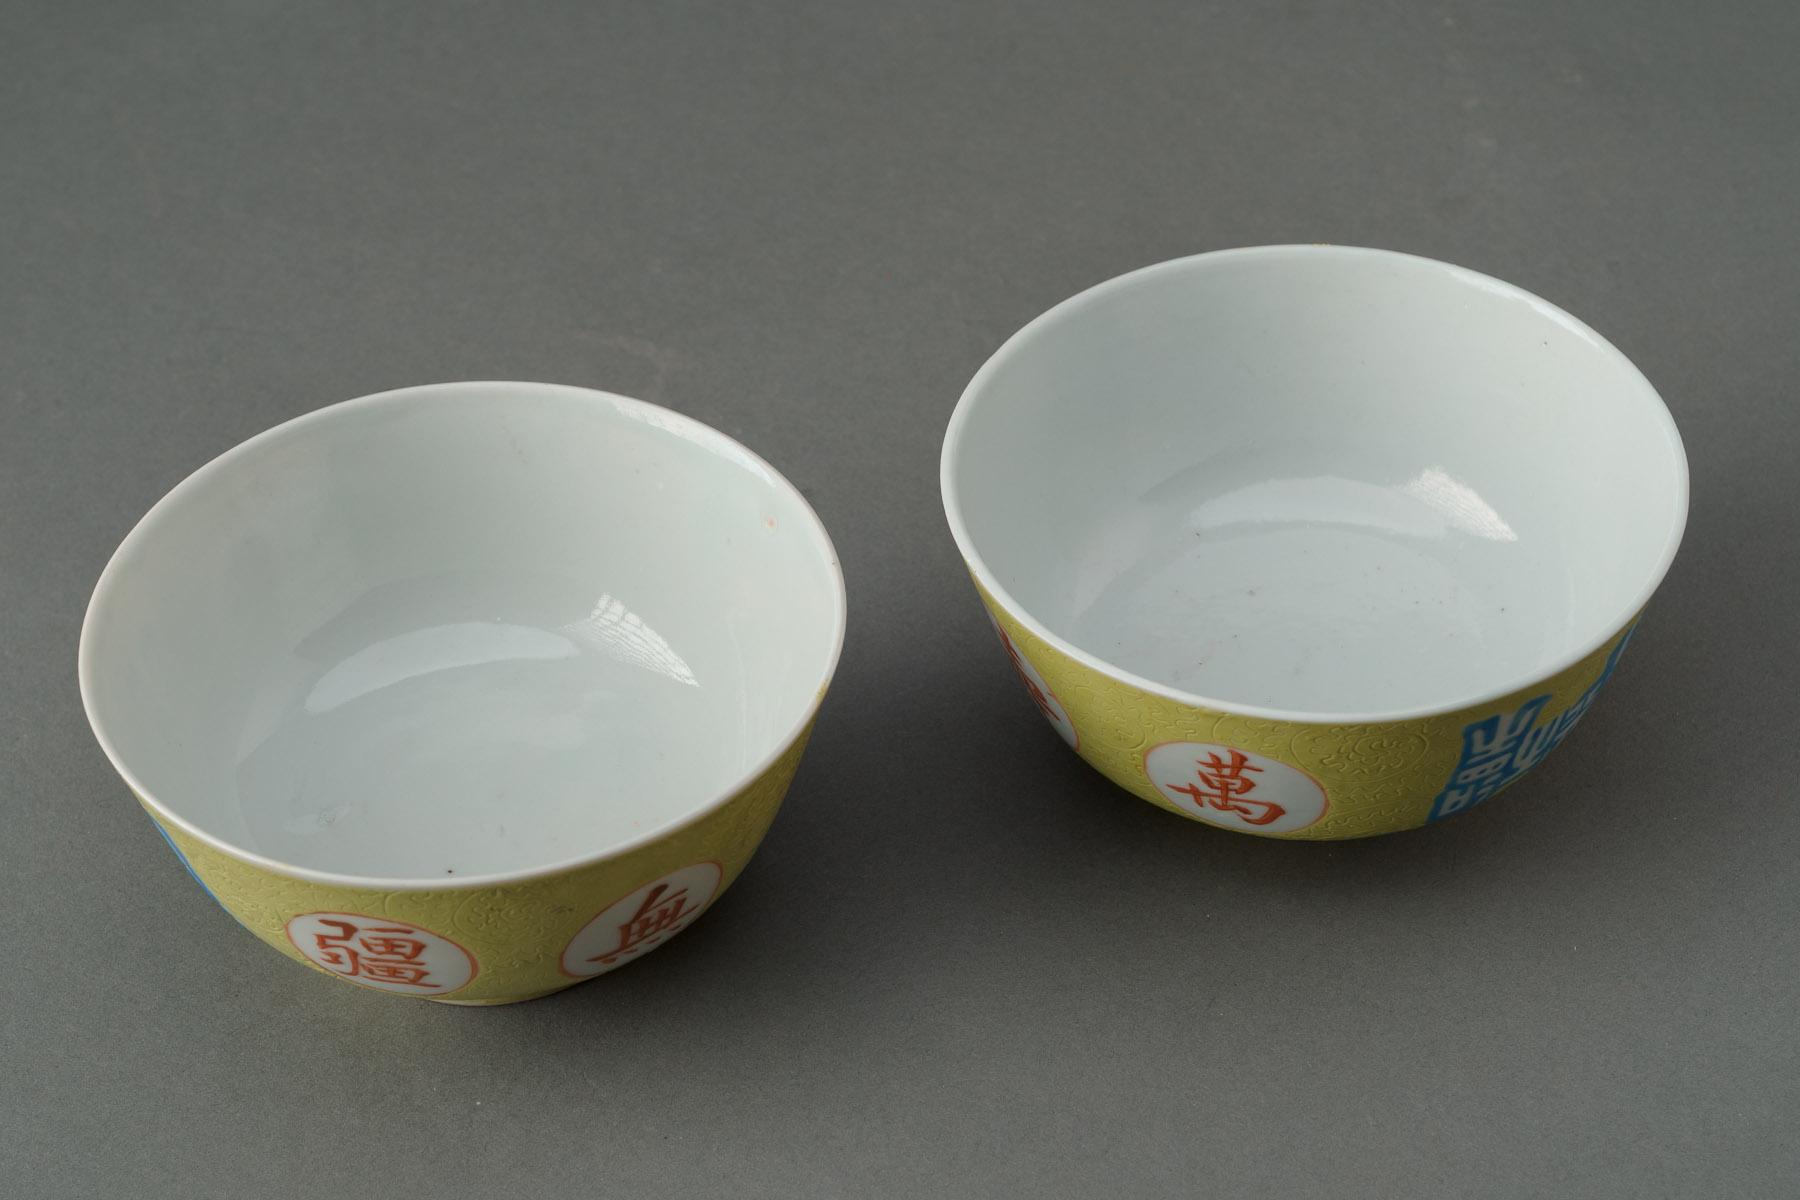 Pair Of Chinese Yellow Bowls